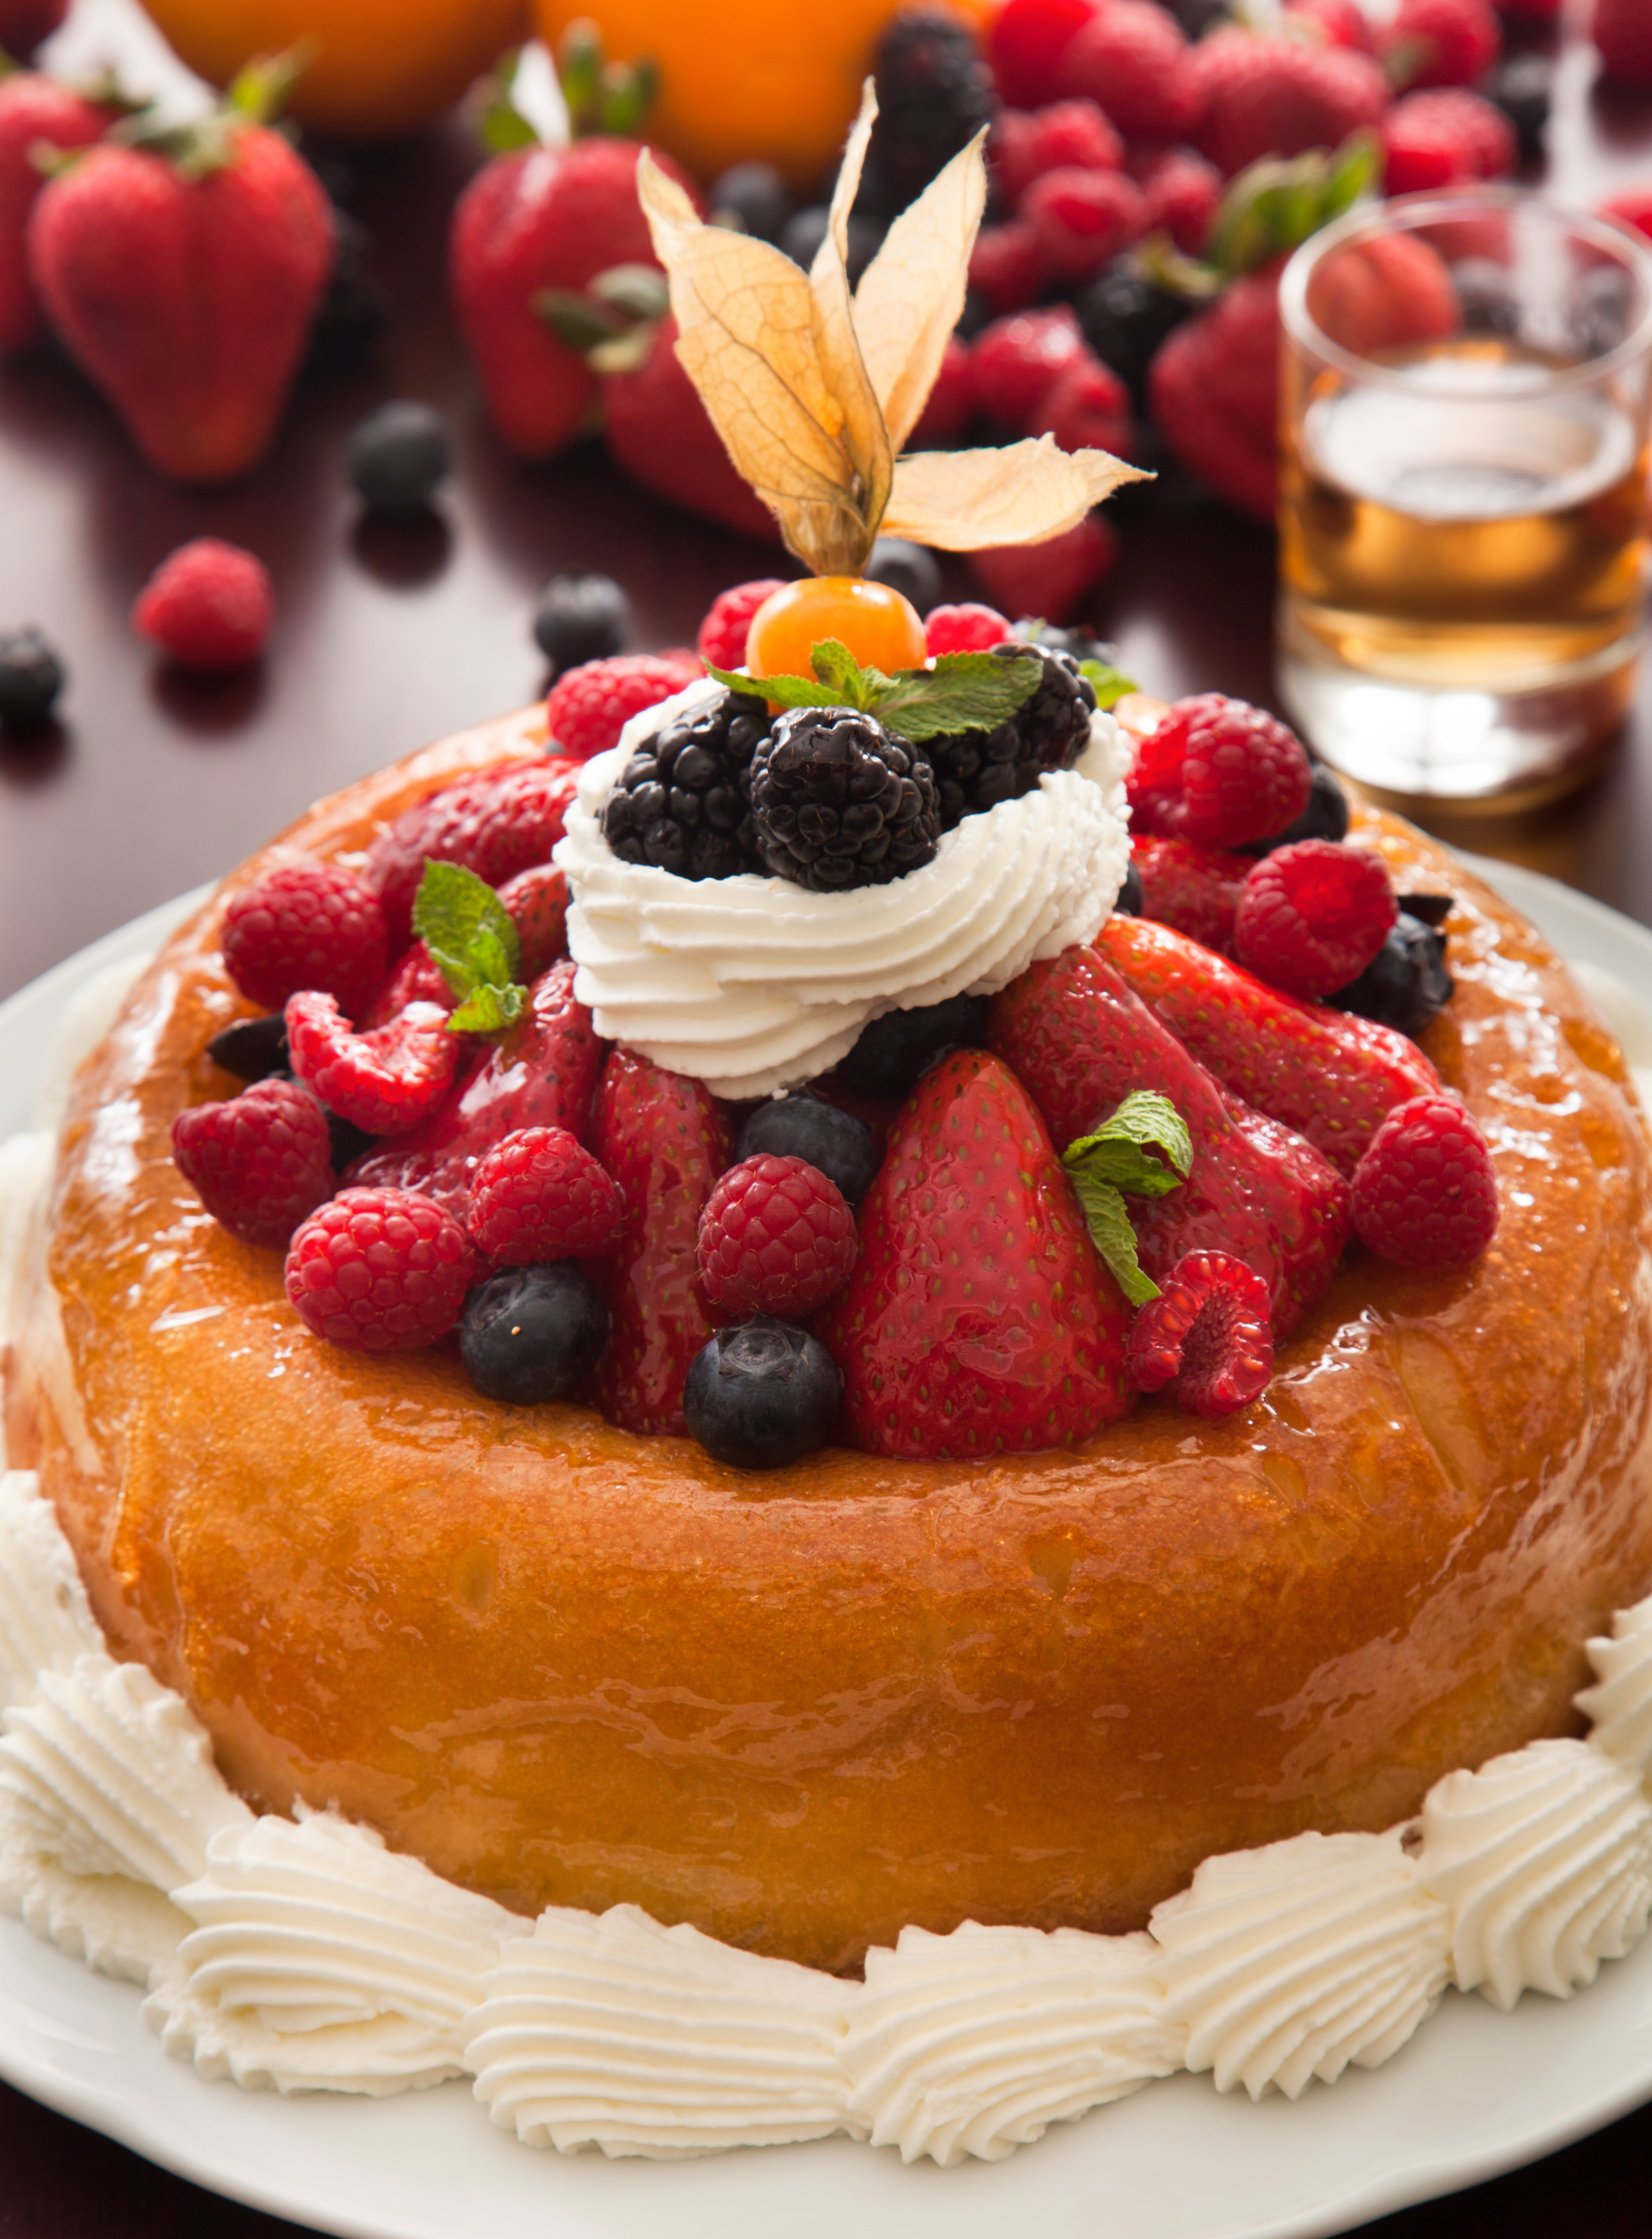 Savarin aux Fruits et a la creme_plated_IMG_4664.jpg